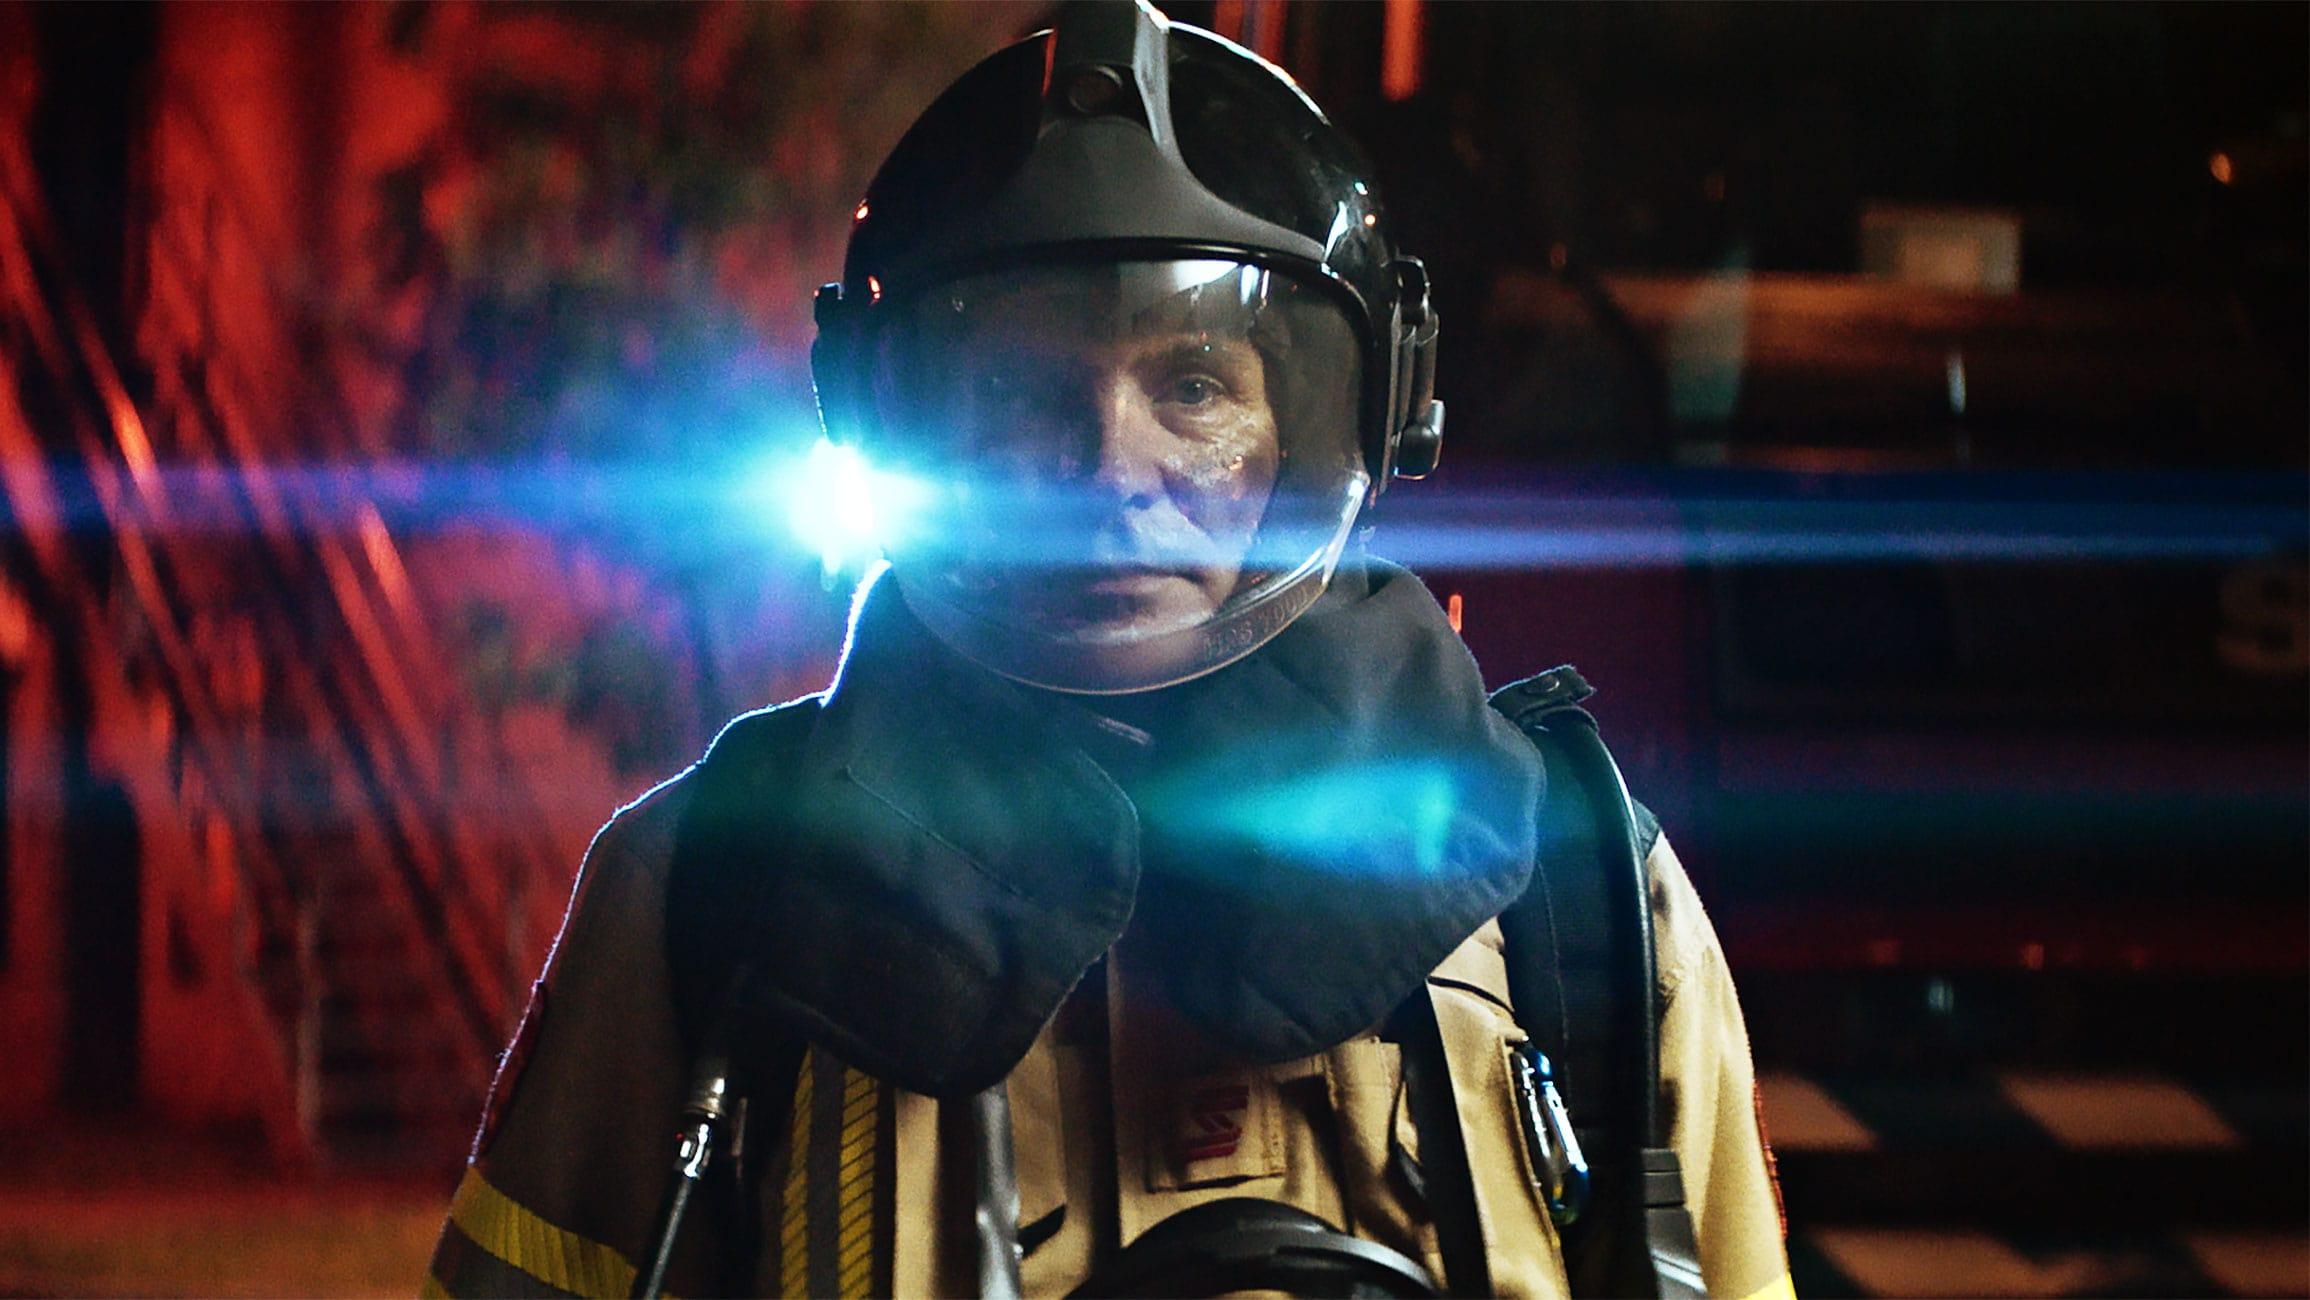 Brandweerman tijdens filmopname in hittebestendige kleding voor campagne Safety & Life protection van Teijin Aramid